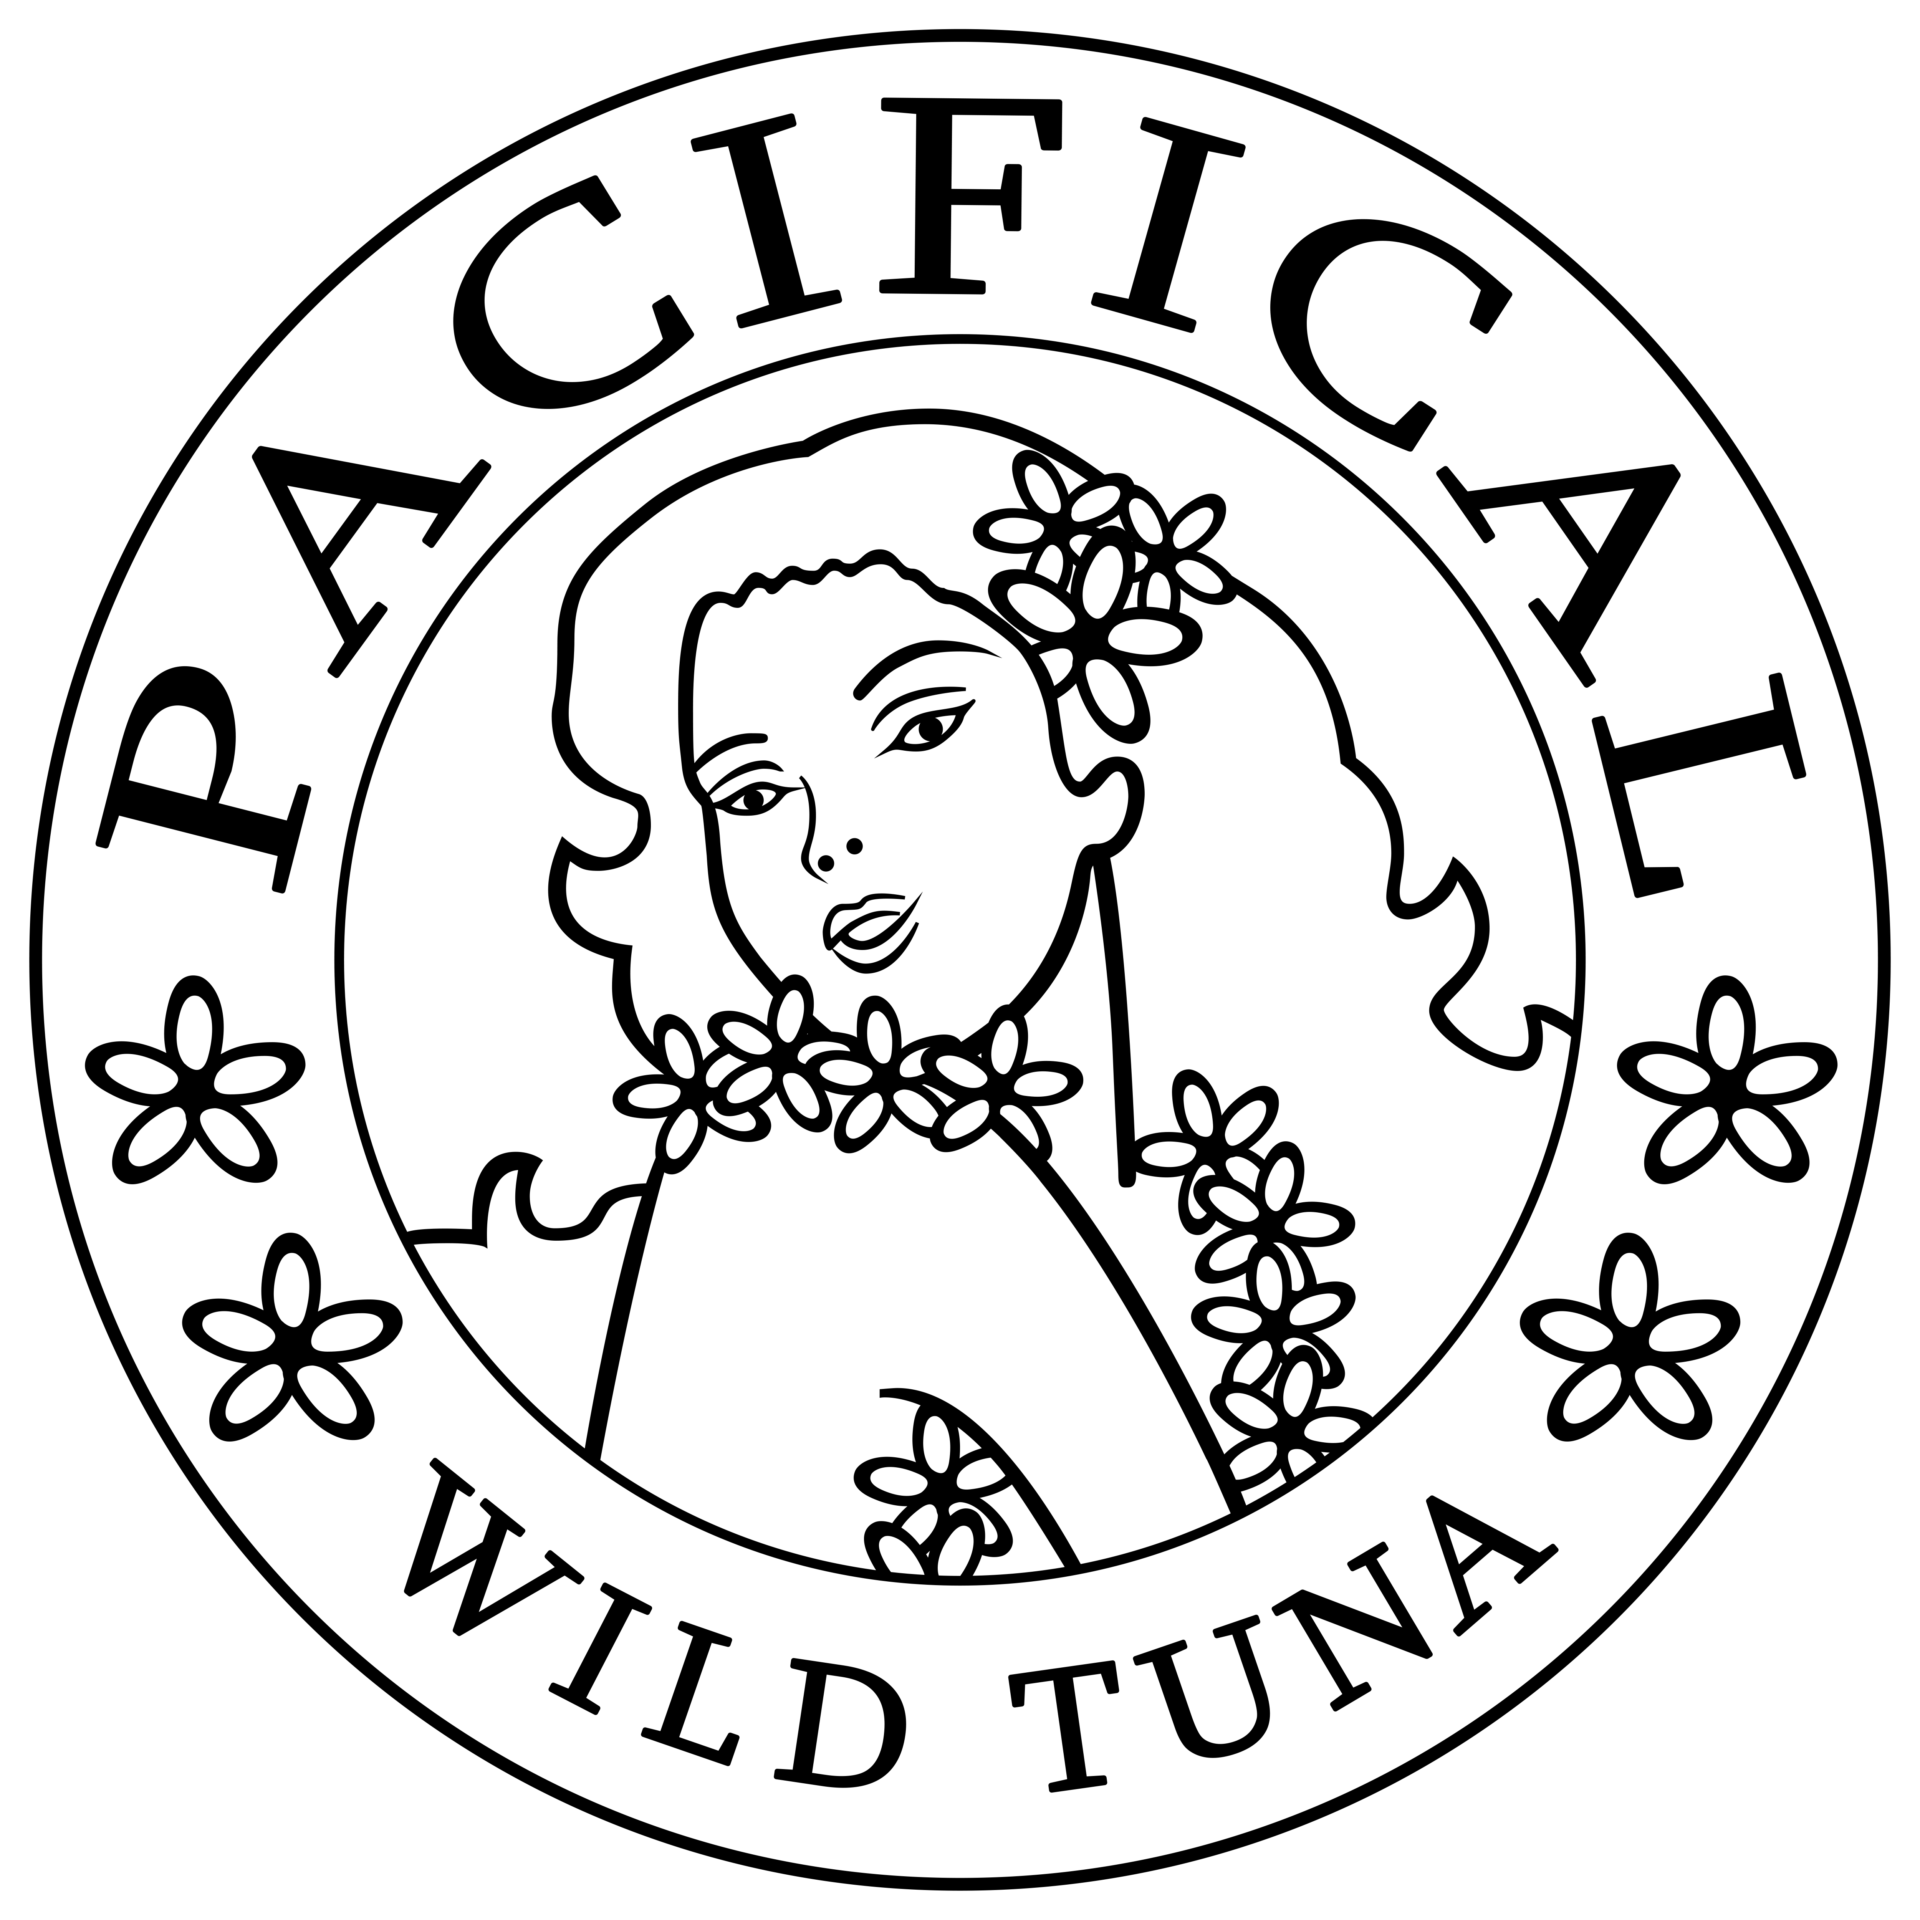 PACIFICAL WILD TUNA